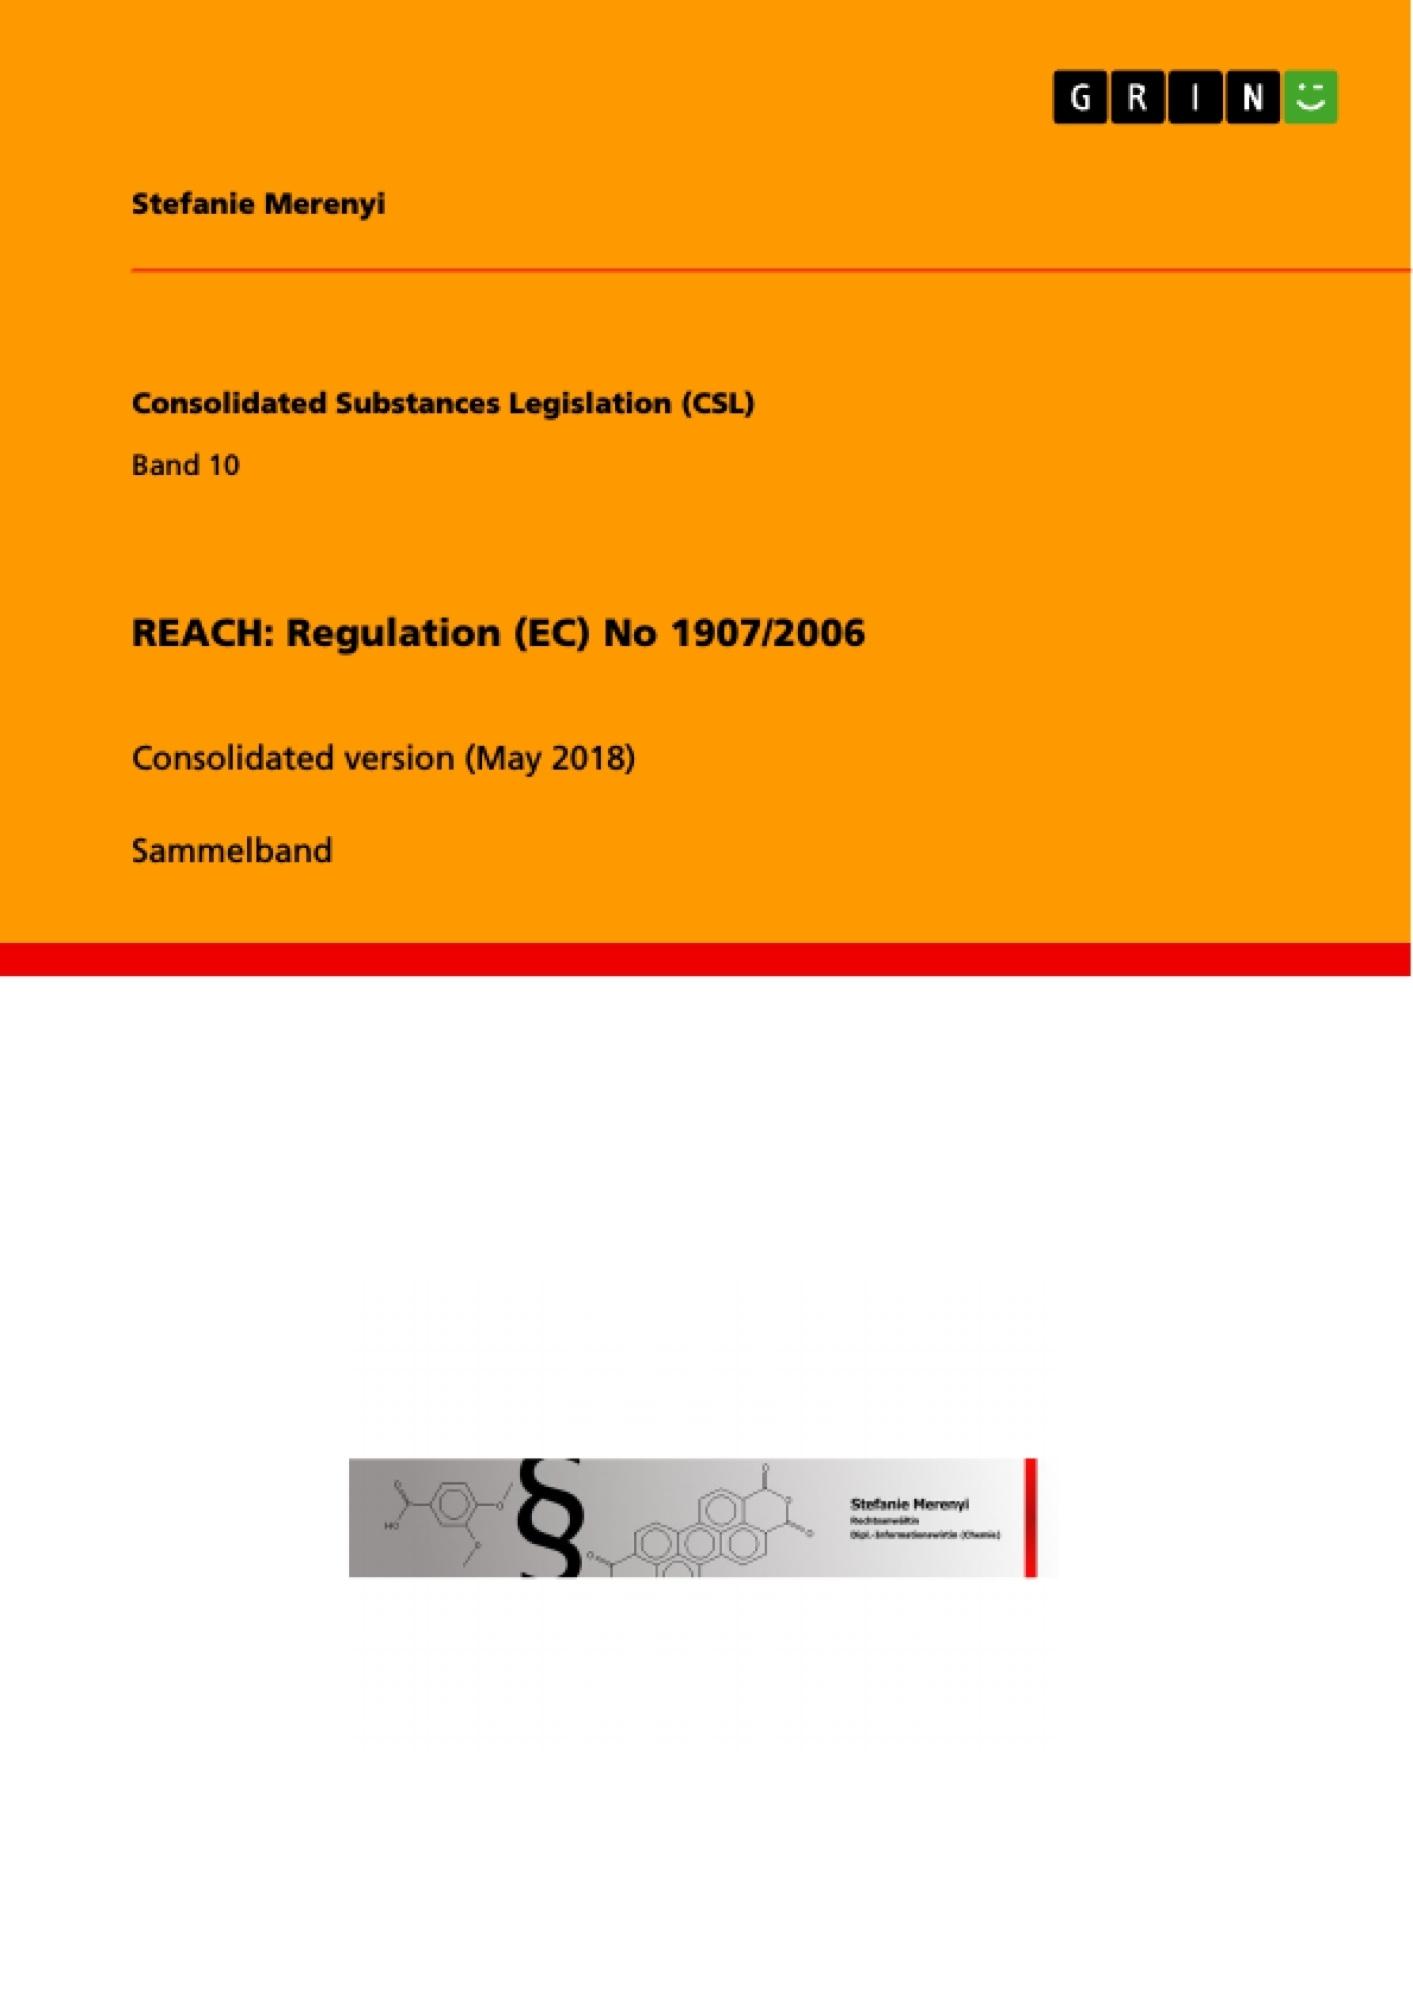 Titel: REACH: Regulation (EC) No 1907/2006